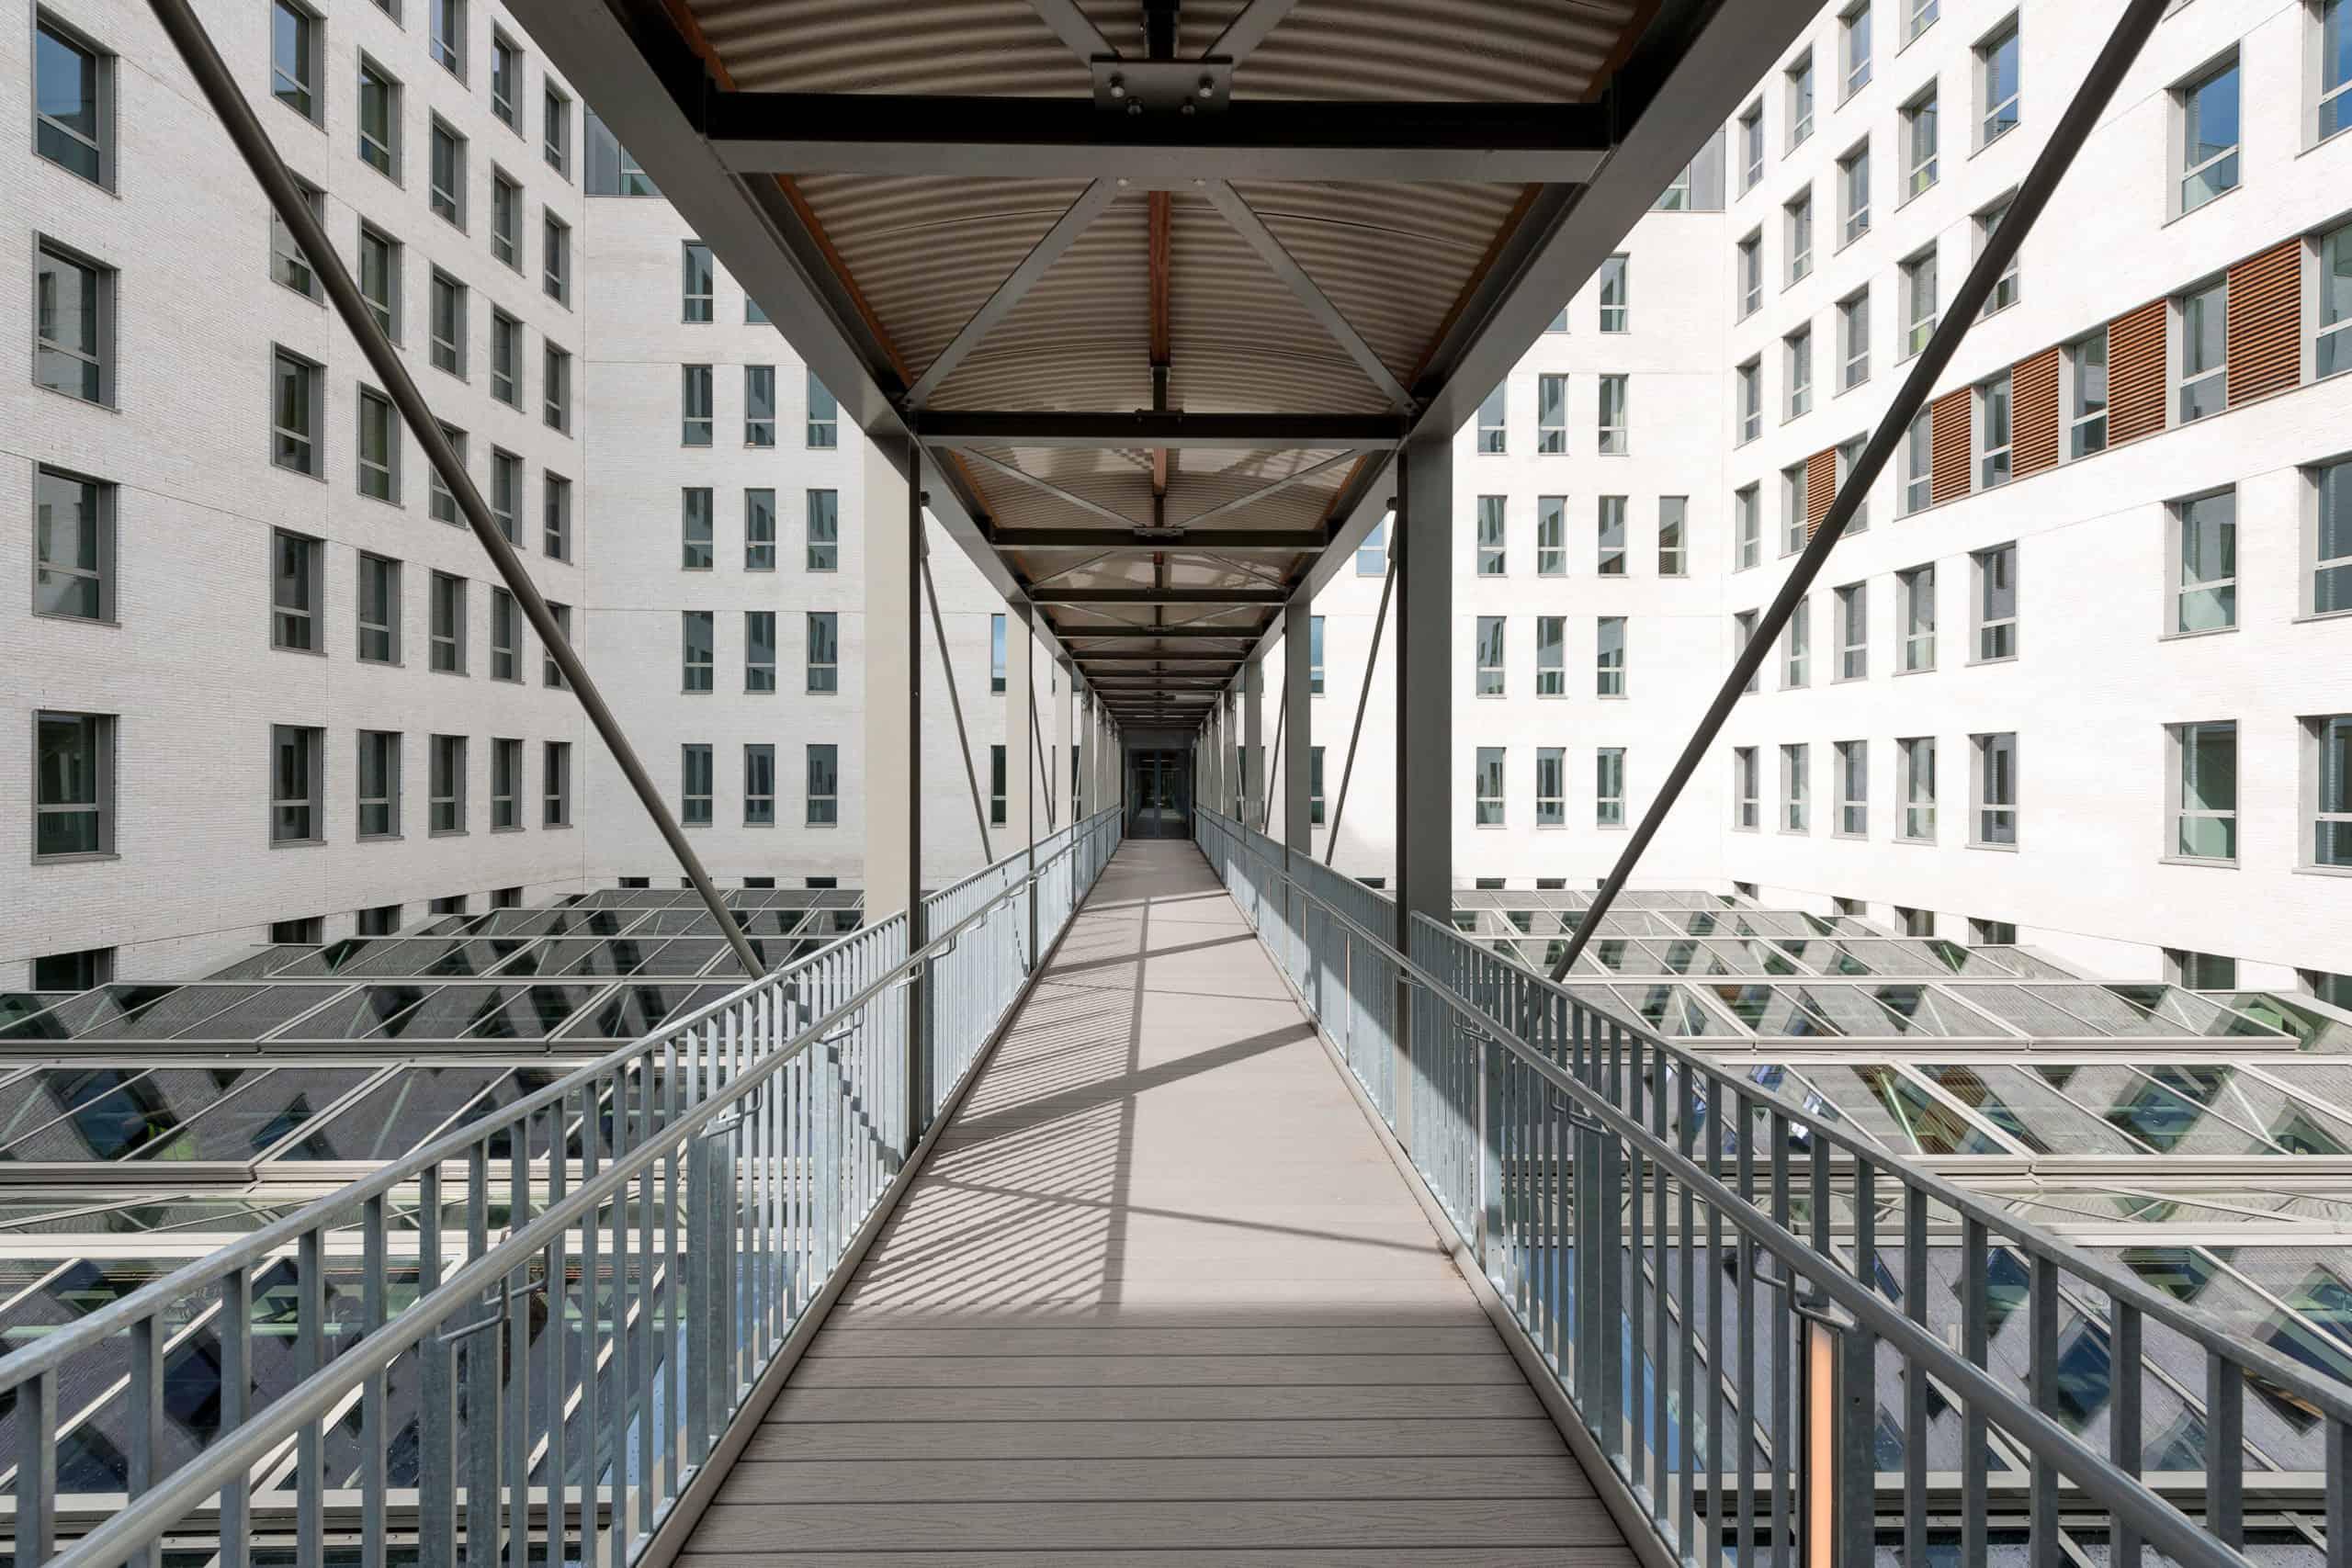 Meander-Medisch-Centrum-3-©-Dirk-Verwoerd-Atelier-Pro-3-scaled